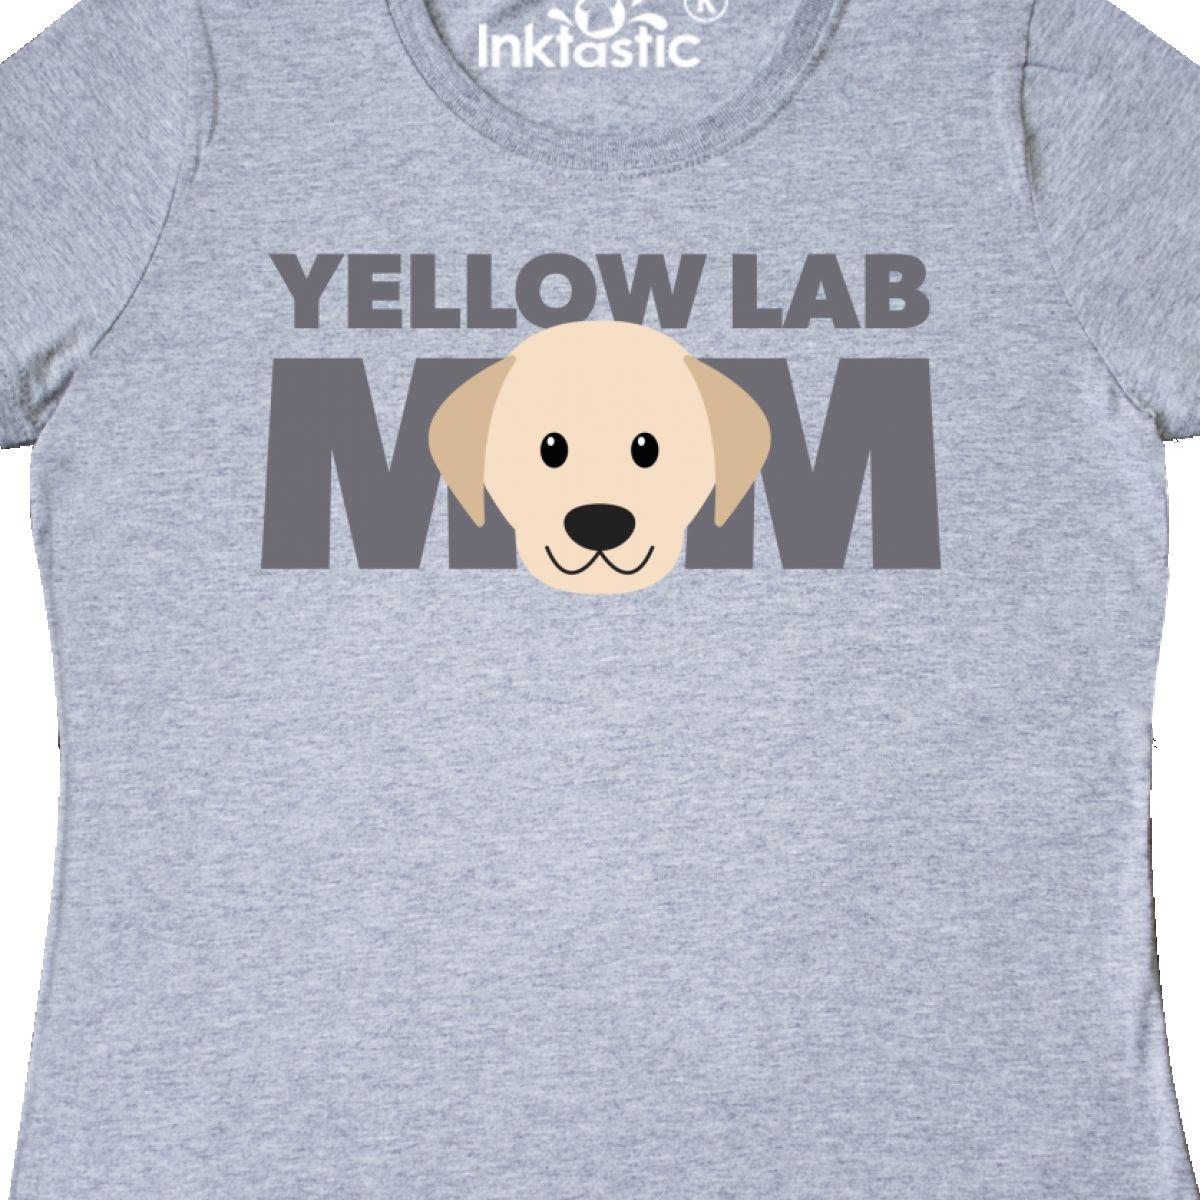 Inktastic Yellow Lab Mom Women/'s T-Shirt Pets Dog Puppy Parent Labrador Clothing